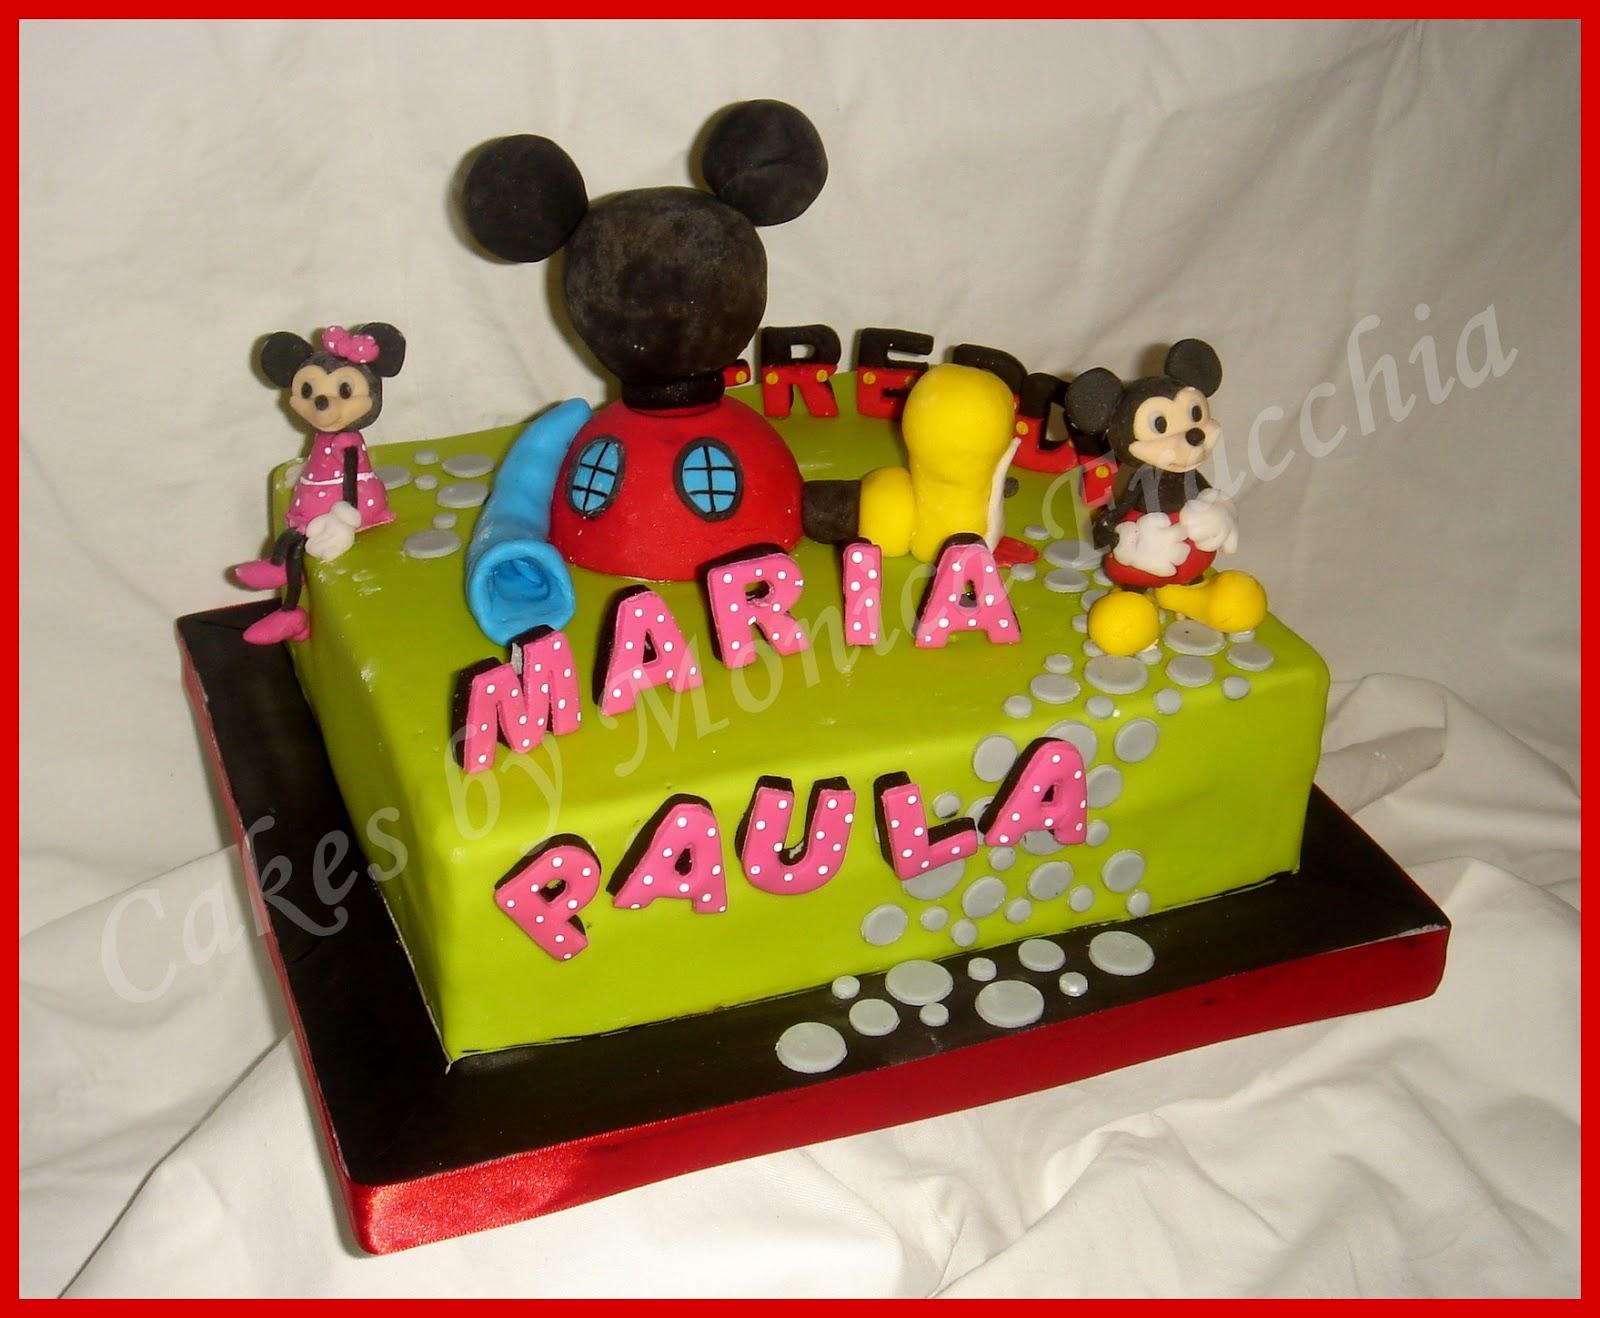 TORTA DECORADA CASA CLUB MICKEY MOUSE   TORTAS CAKES BY MONICA ...